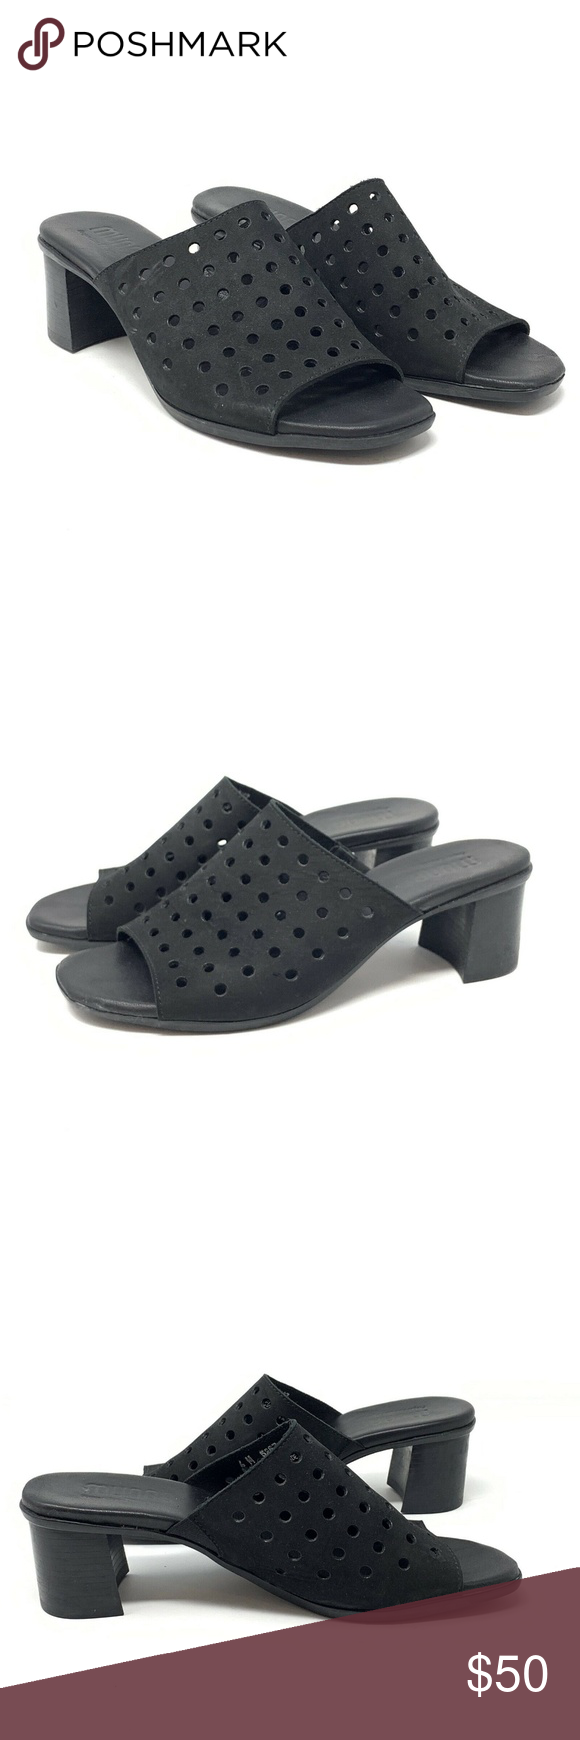 Munro Jules Mules Comfort Heeled Slides Sandals Comfortable Heels Heels Slide Sandals